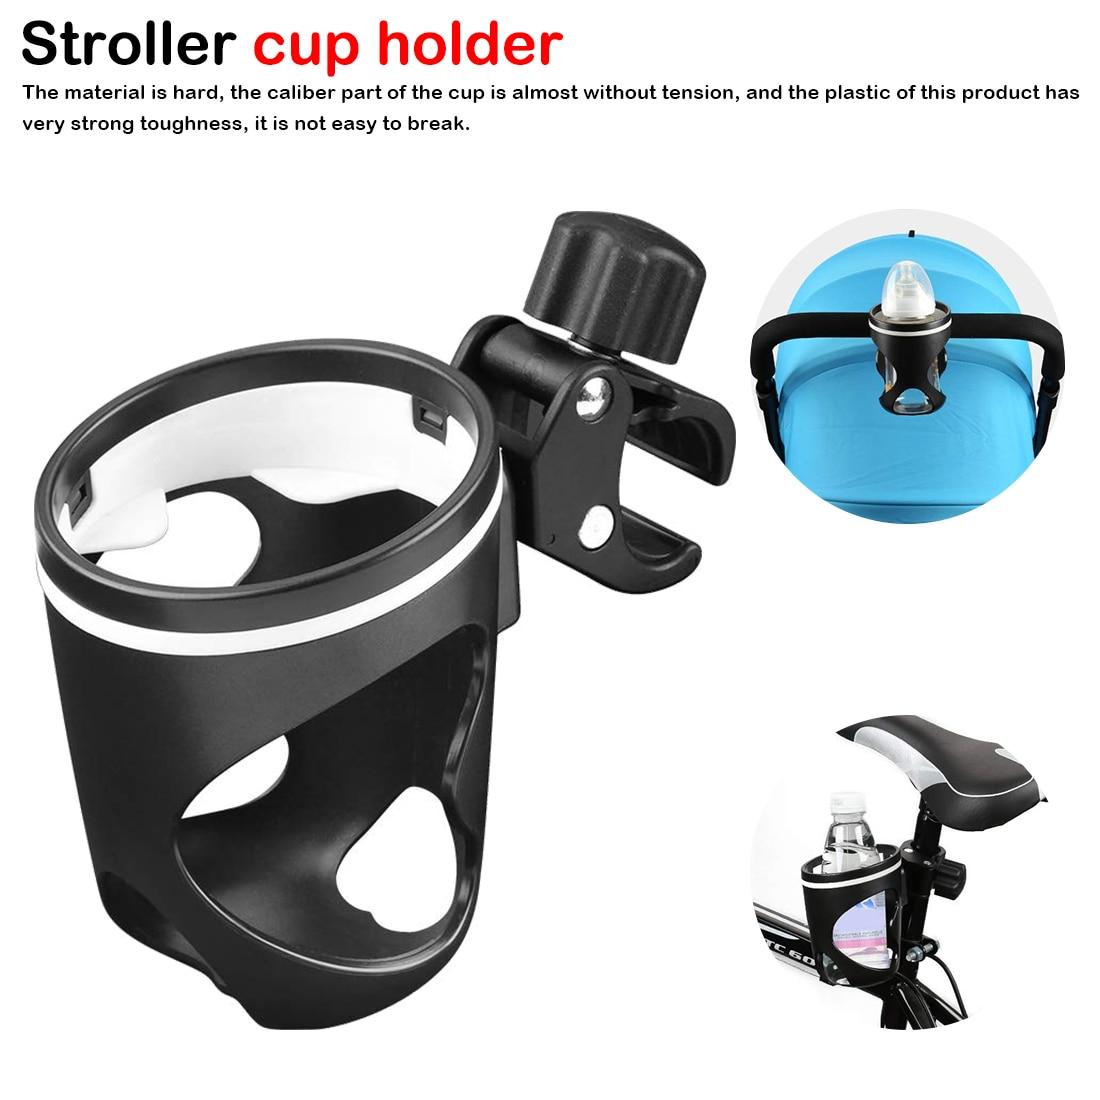 New Baby Stroller Cup Holder Rack Bottle Universal 360 Rotatable Cup Holder For Milk Bottle Cart Pram Stroller Accessories